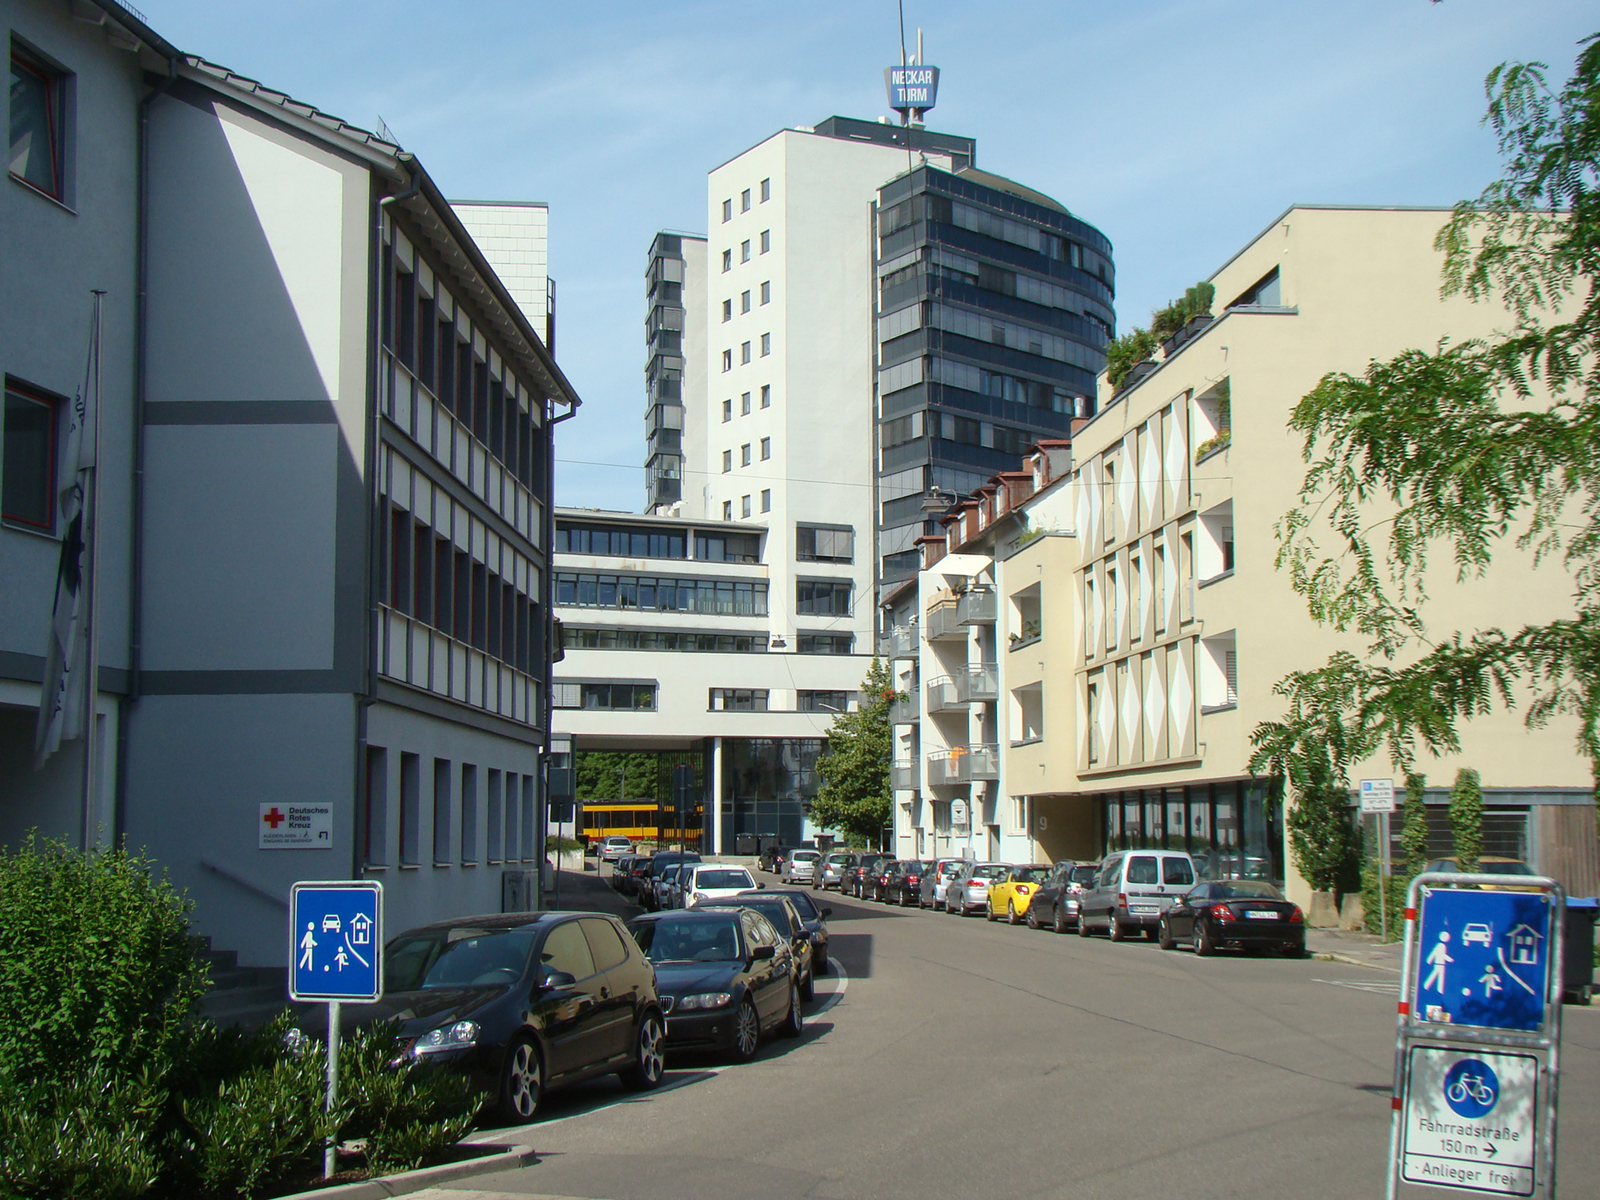 be9f9fc40473 Frankfurter Straße (Heilbronn) – Wikipedia